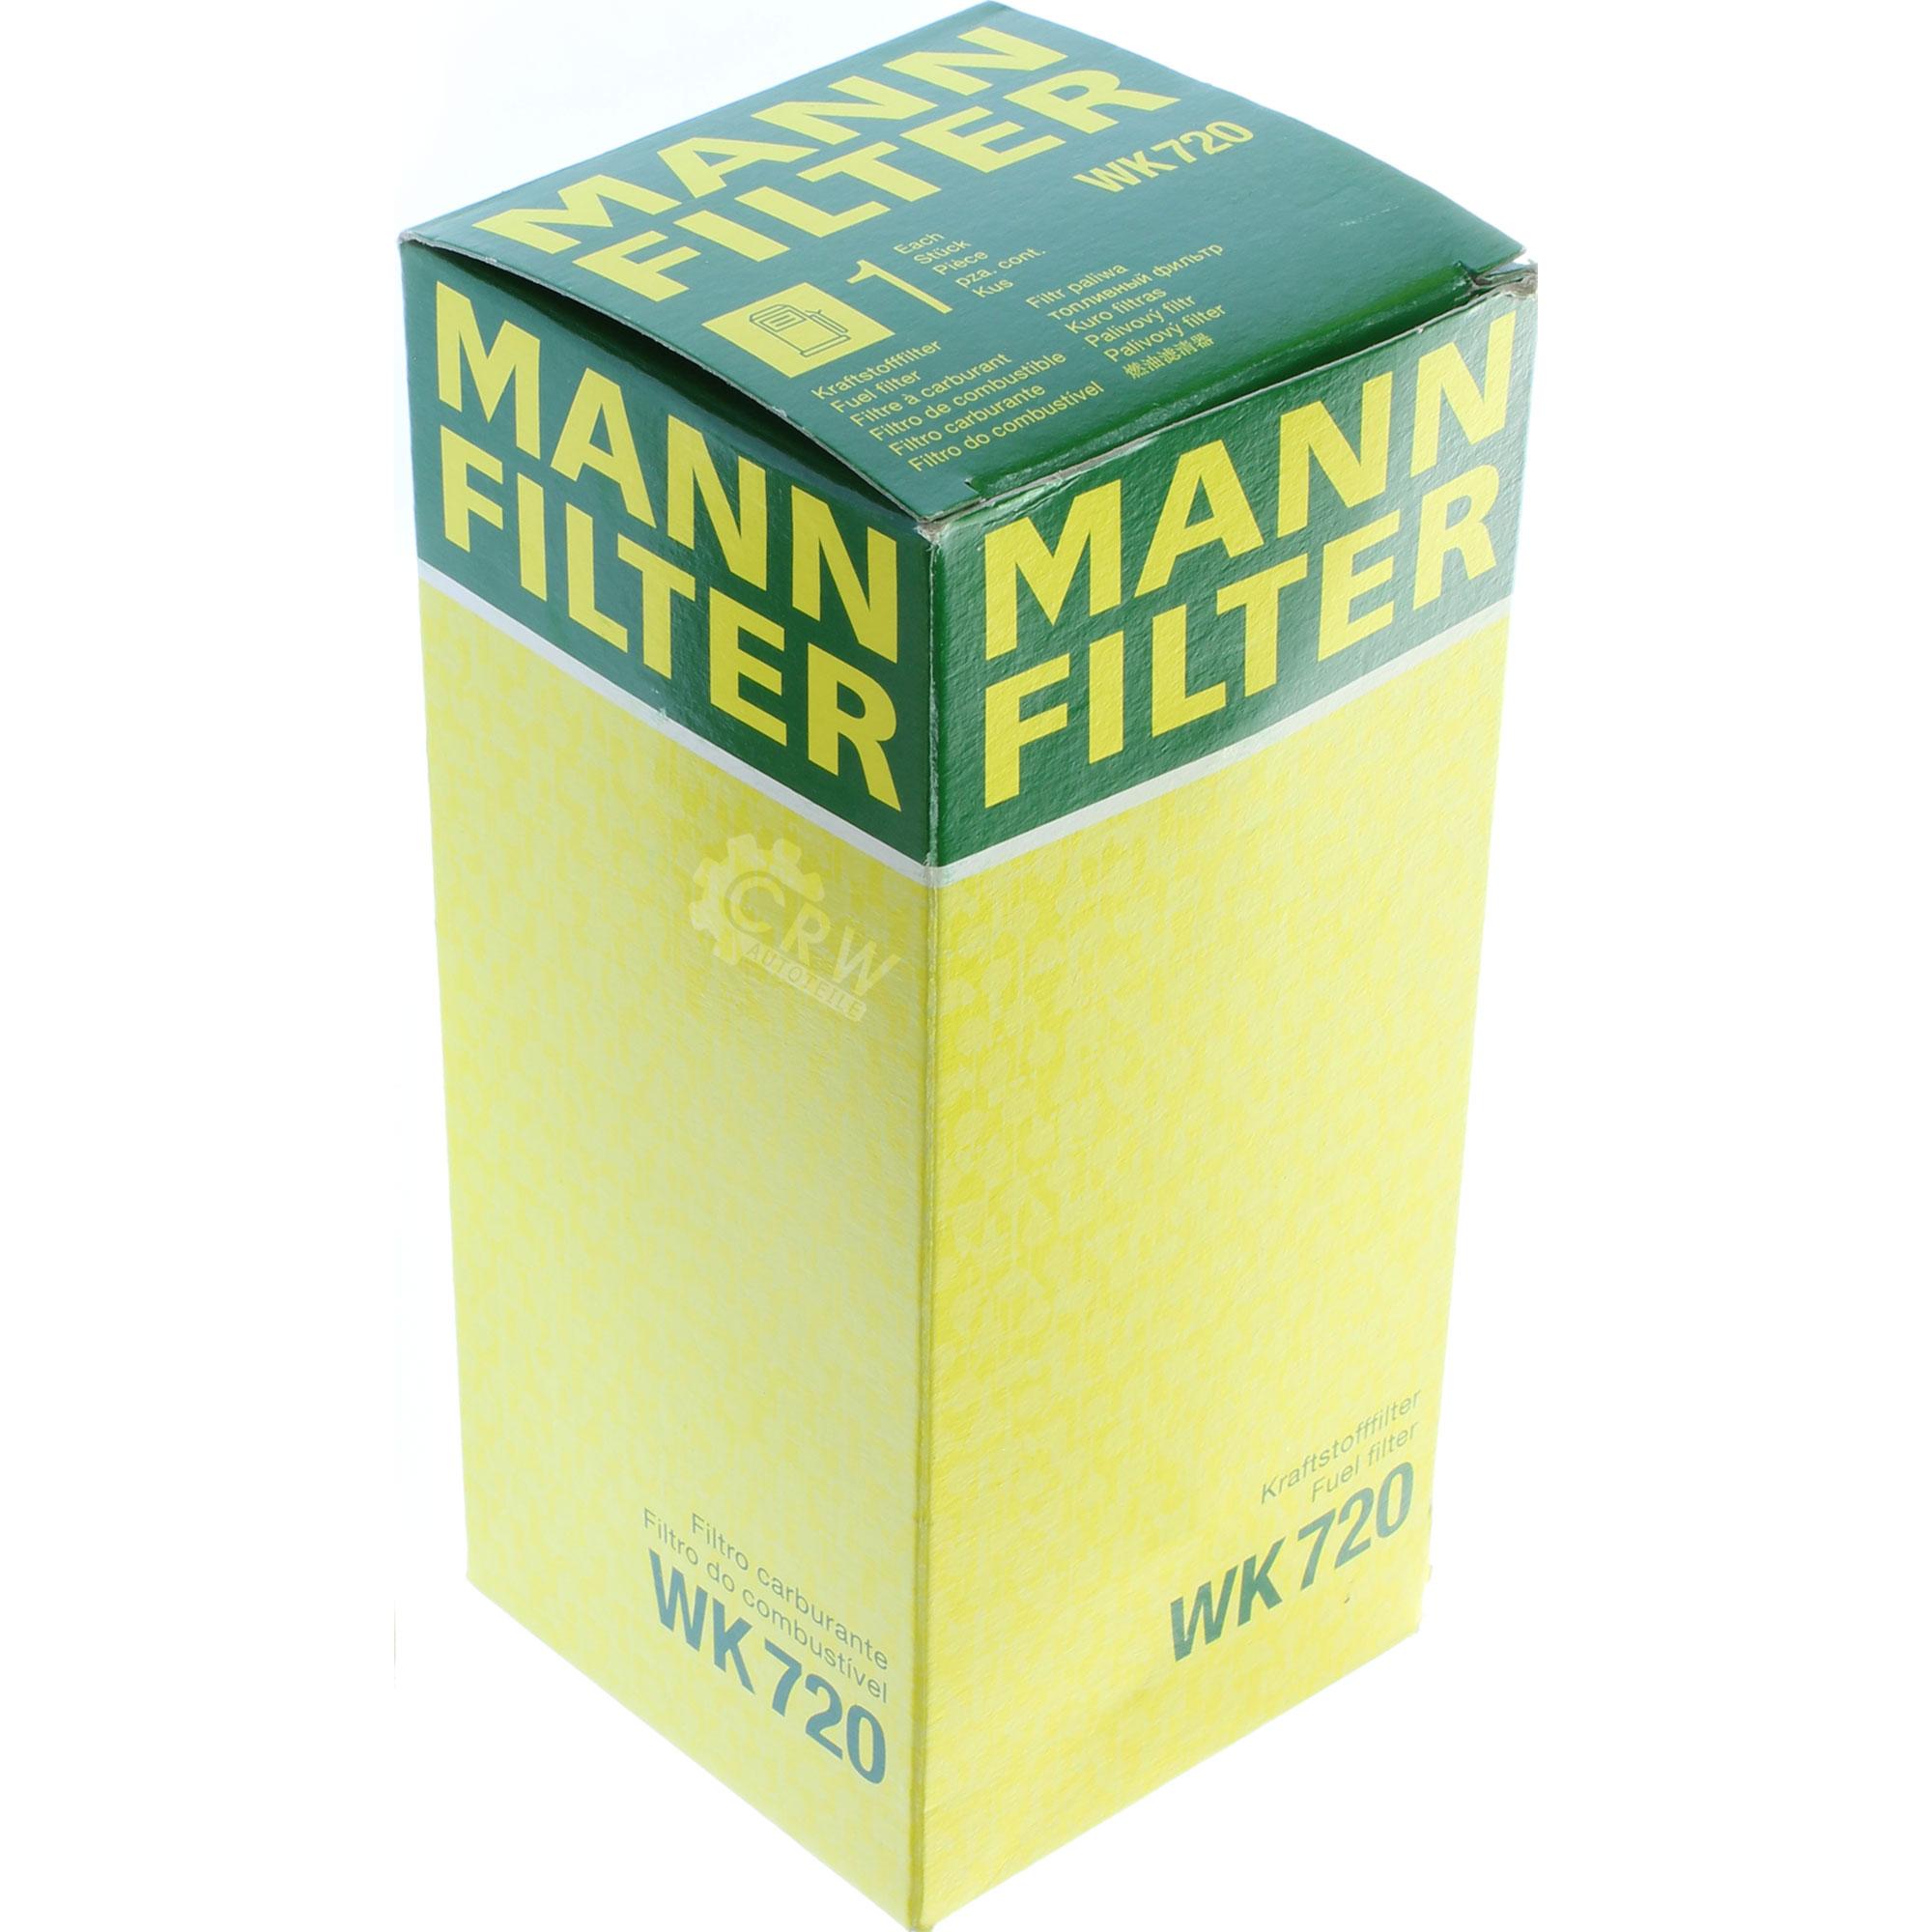 Motor-aceite-8l-MANNOL-Classic-10w-40-hombre-filtro-Filtro-paquete-Mercedes-Benz-CLK-c208 miniatura 12